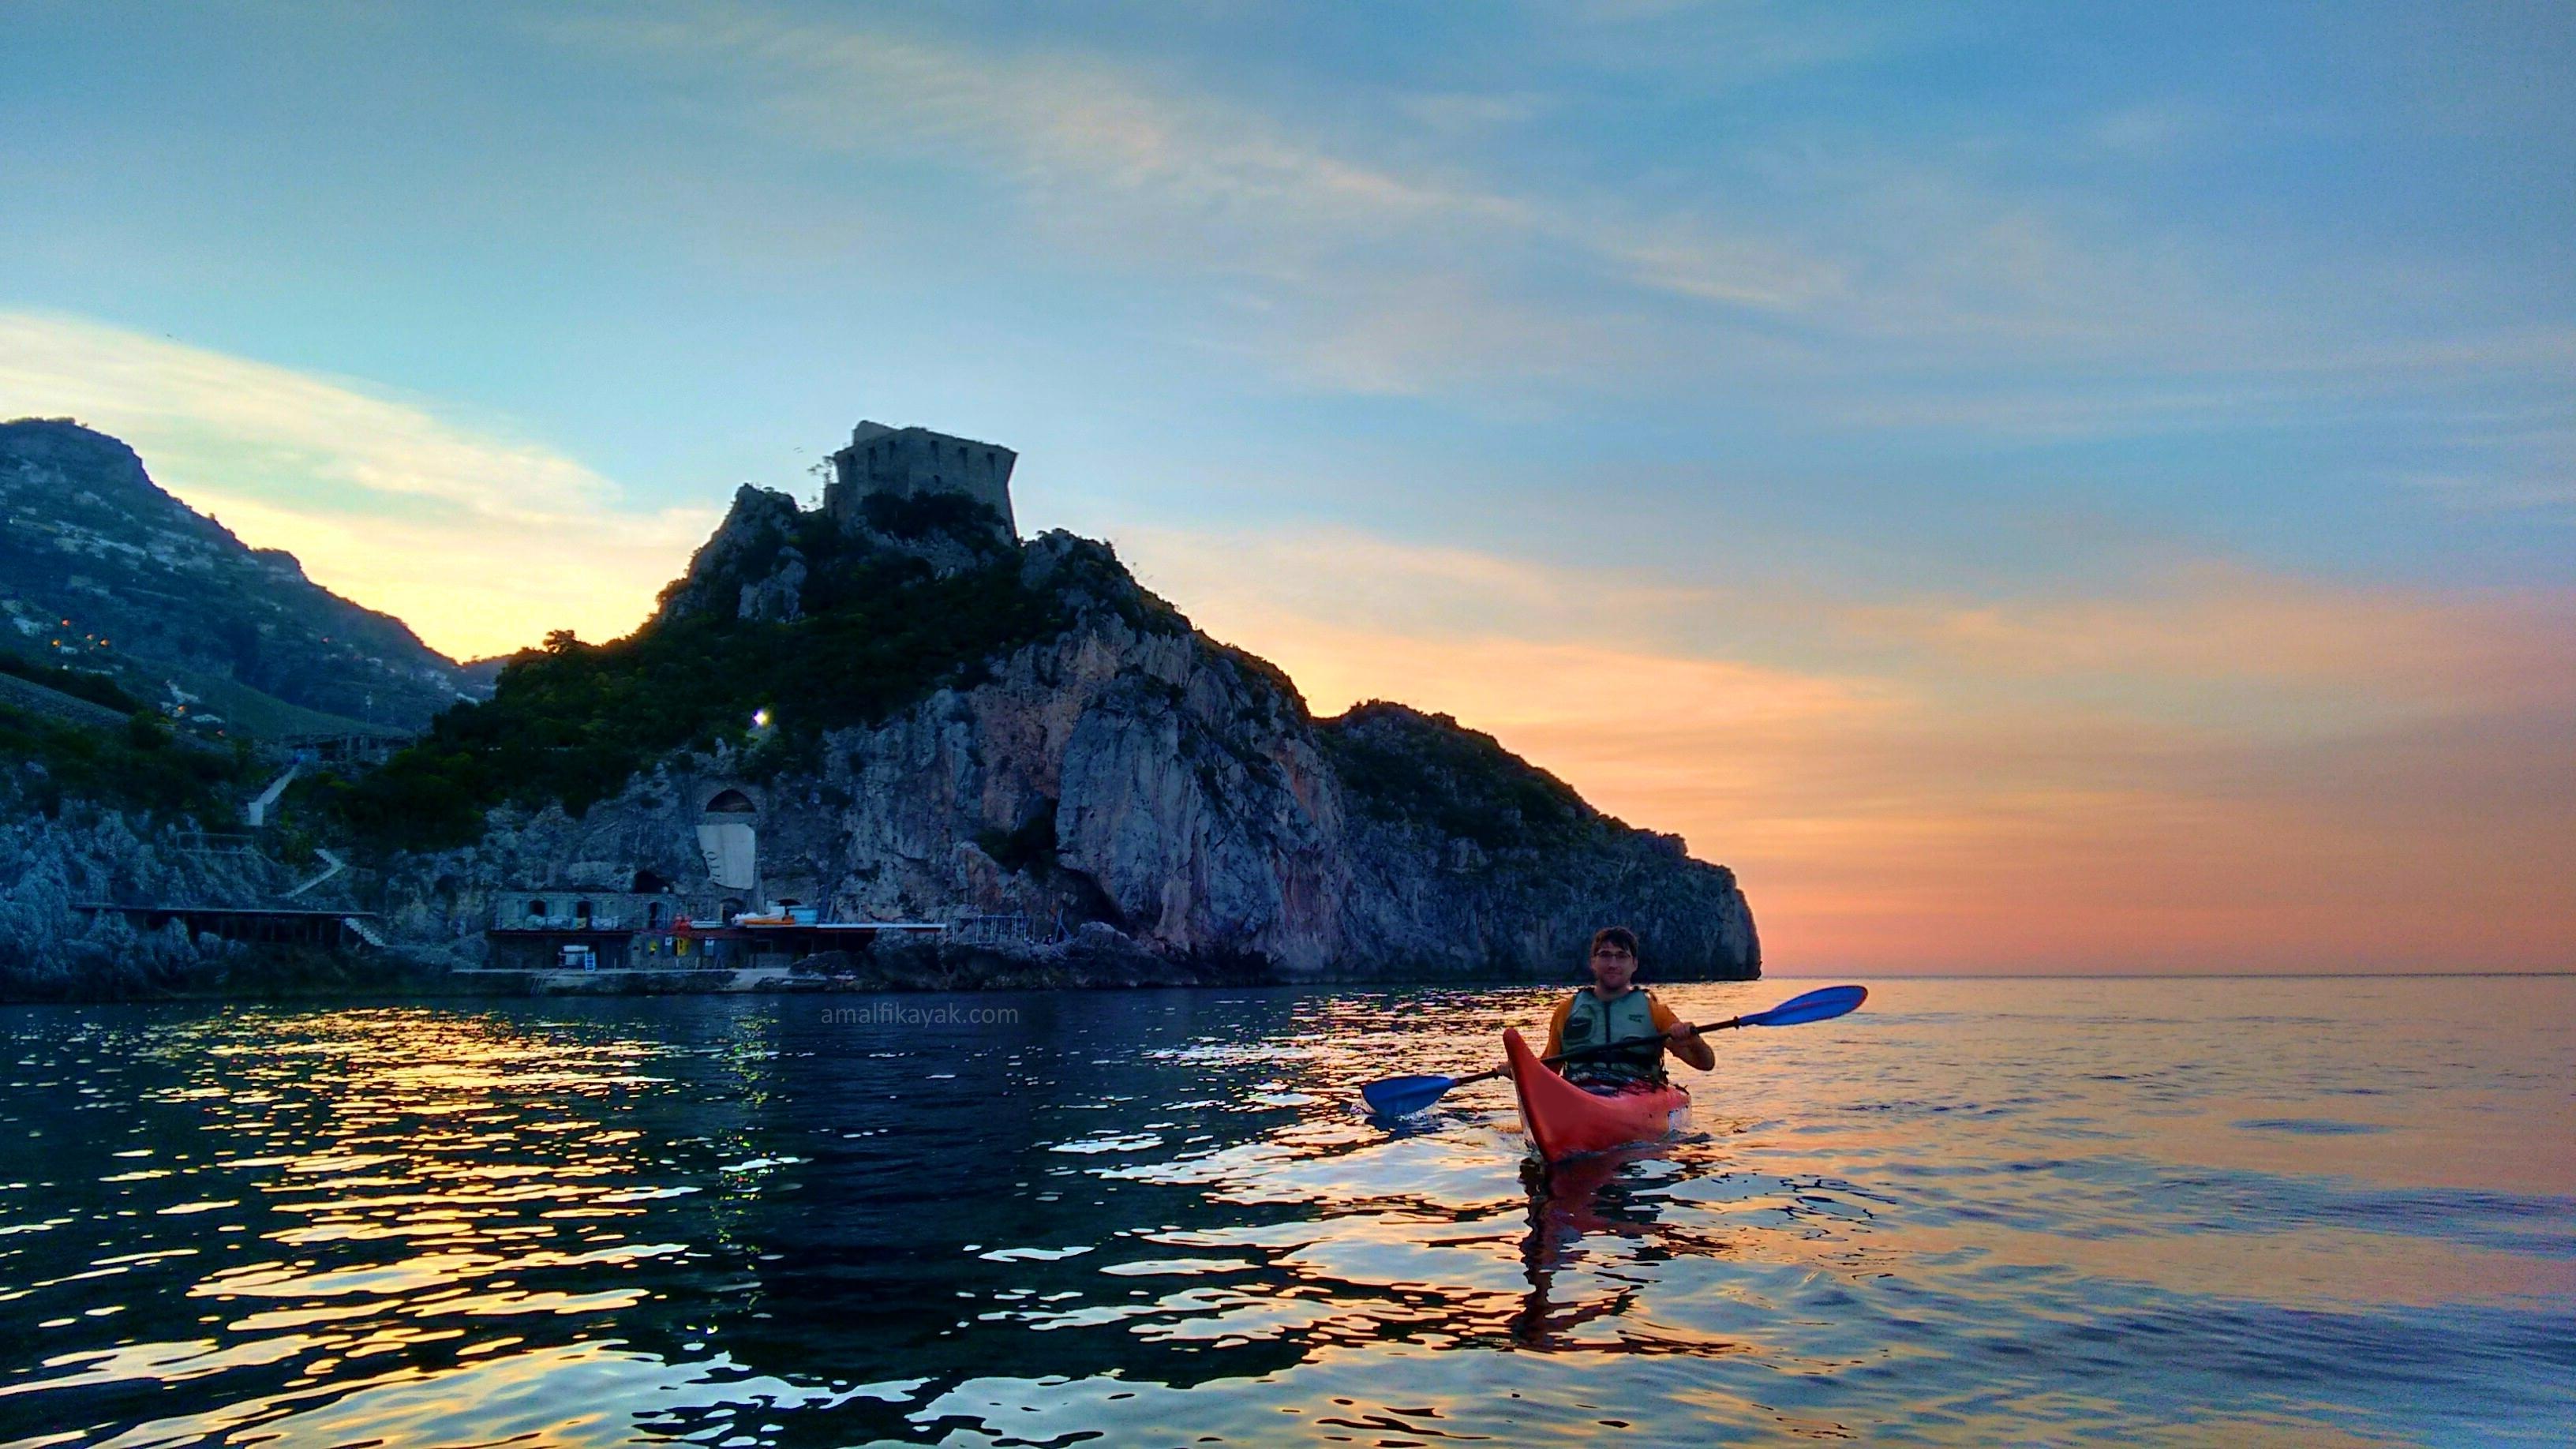 Conca dei Marini cape - Amalfi Kayak